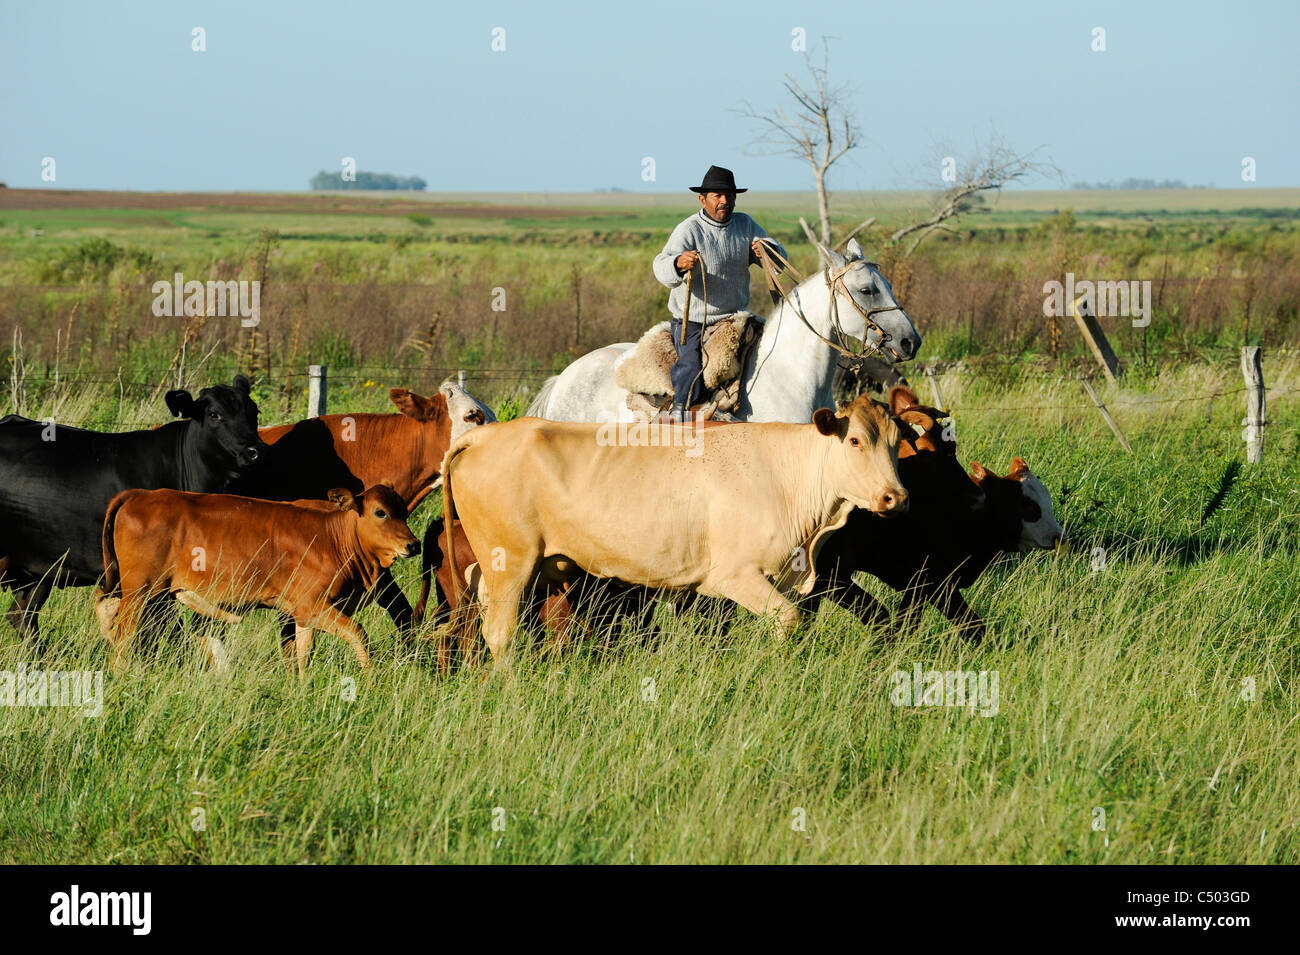 URUGUAY - Tacuarembo, vaches et chevaux sur Gaucho Photo Stock